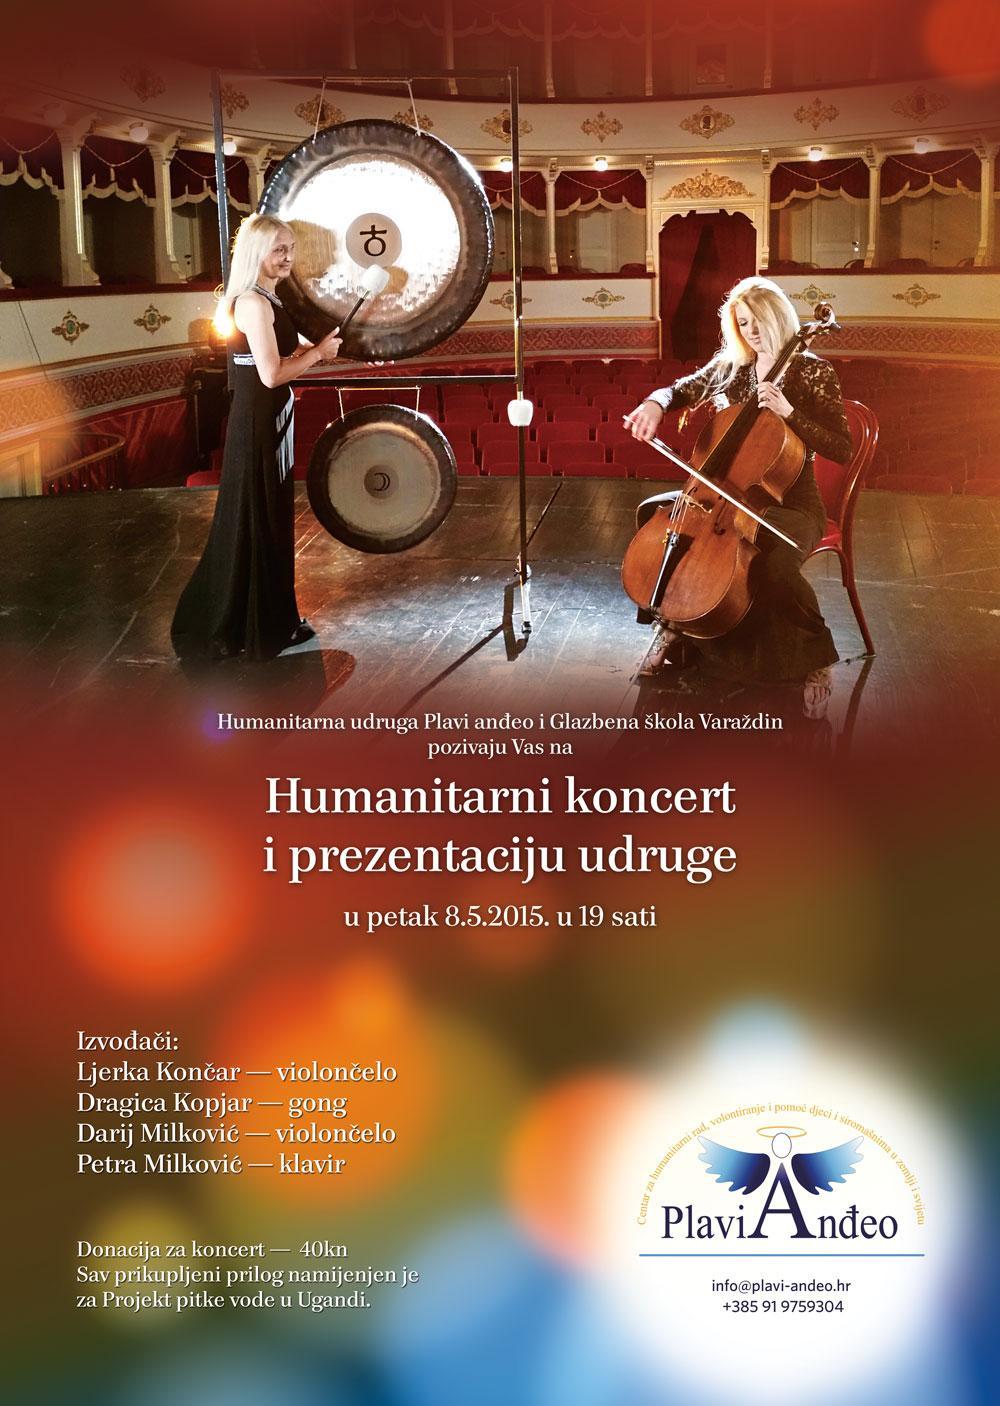 Humanitarni koncert u Varaždinu